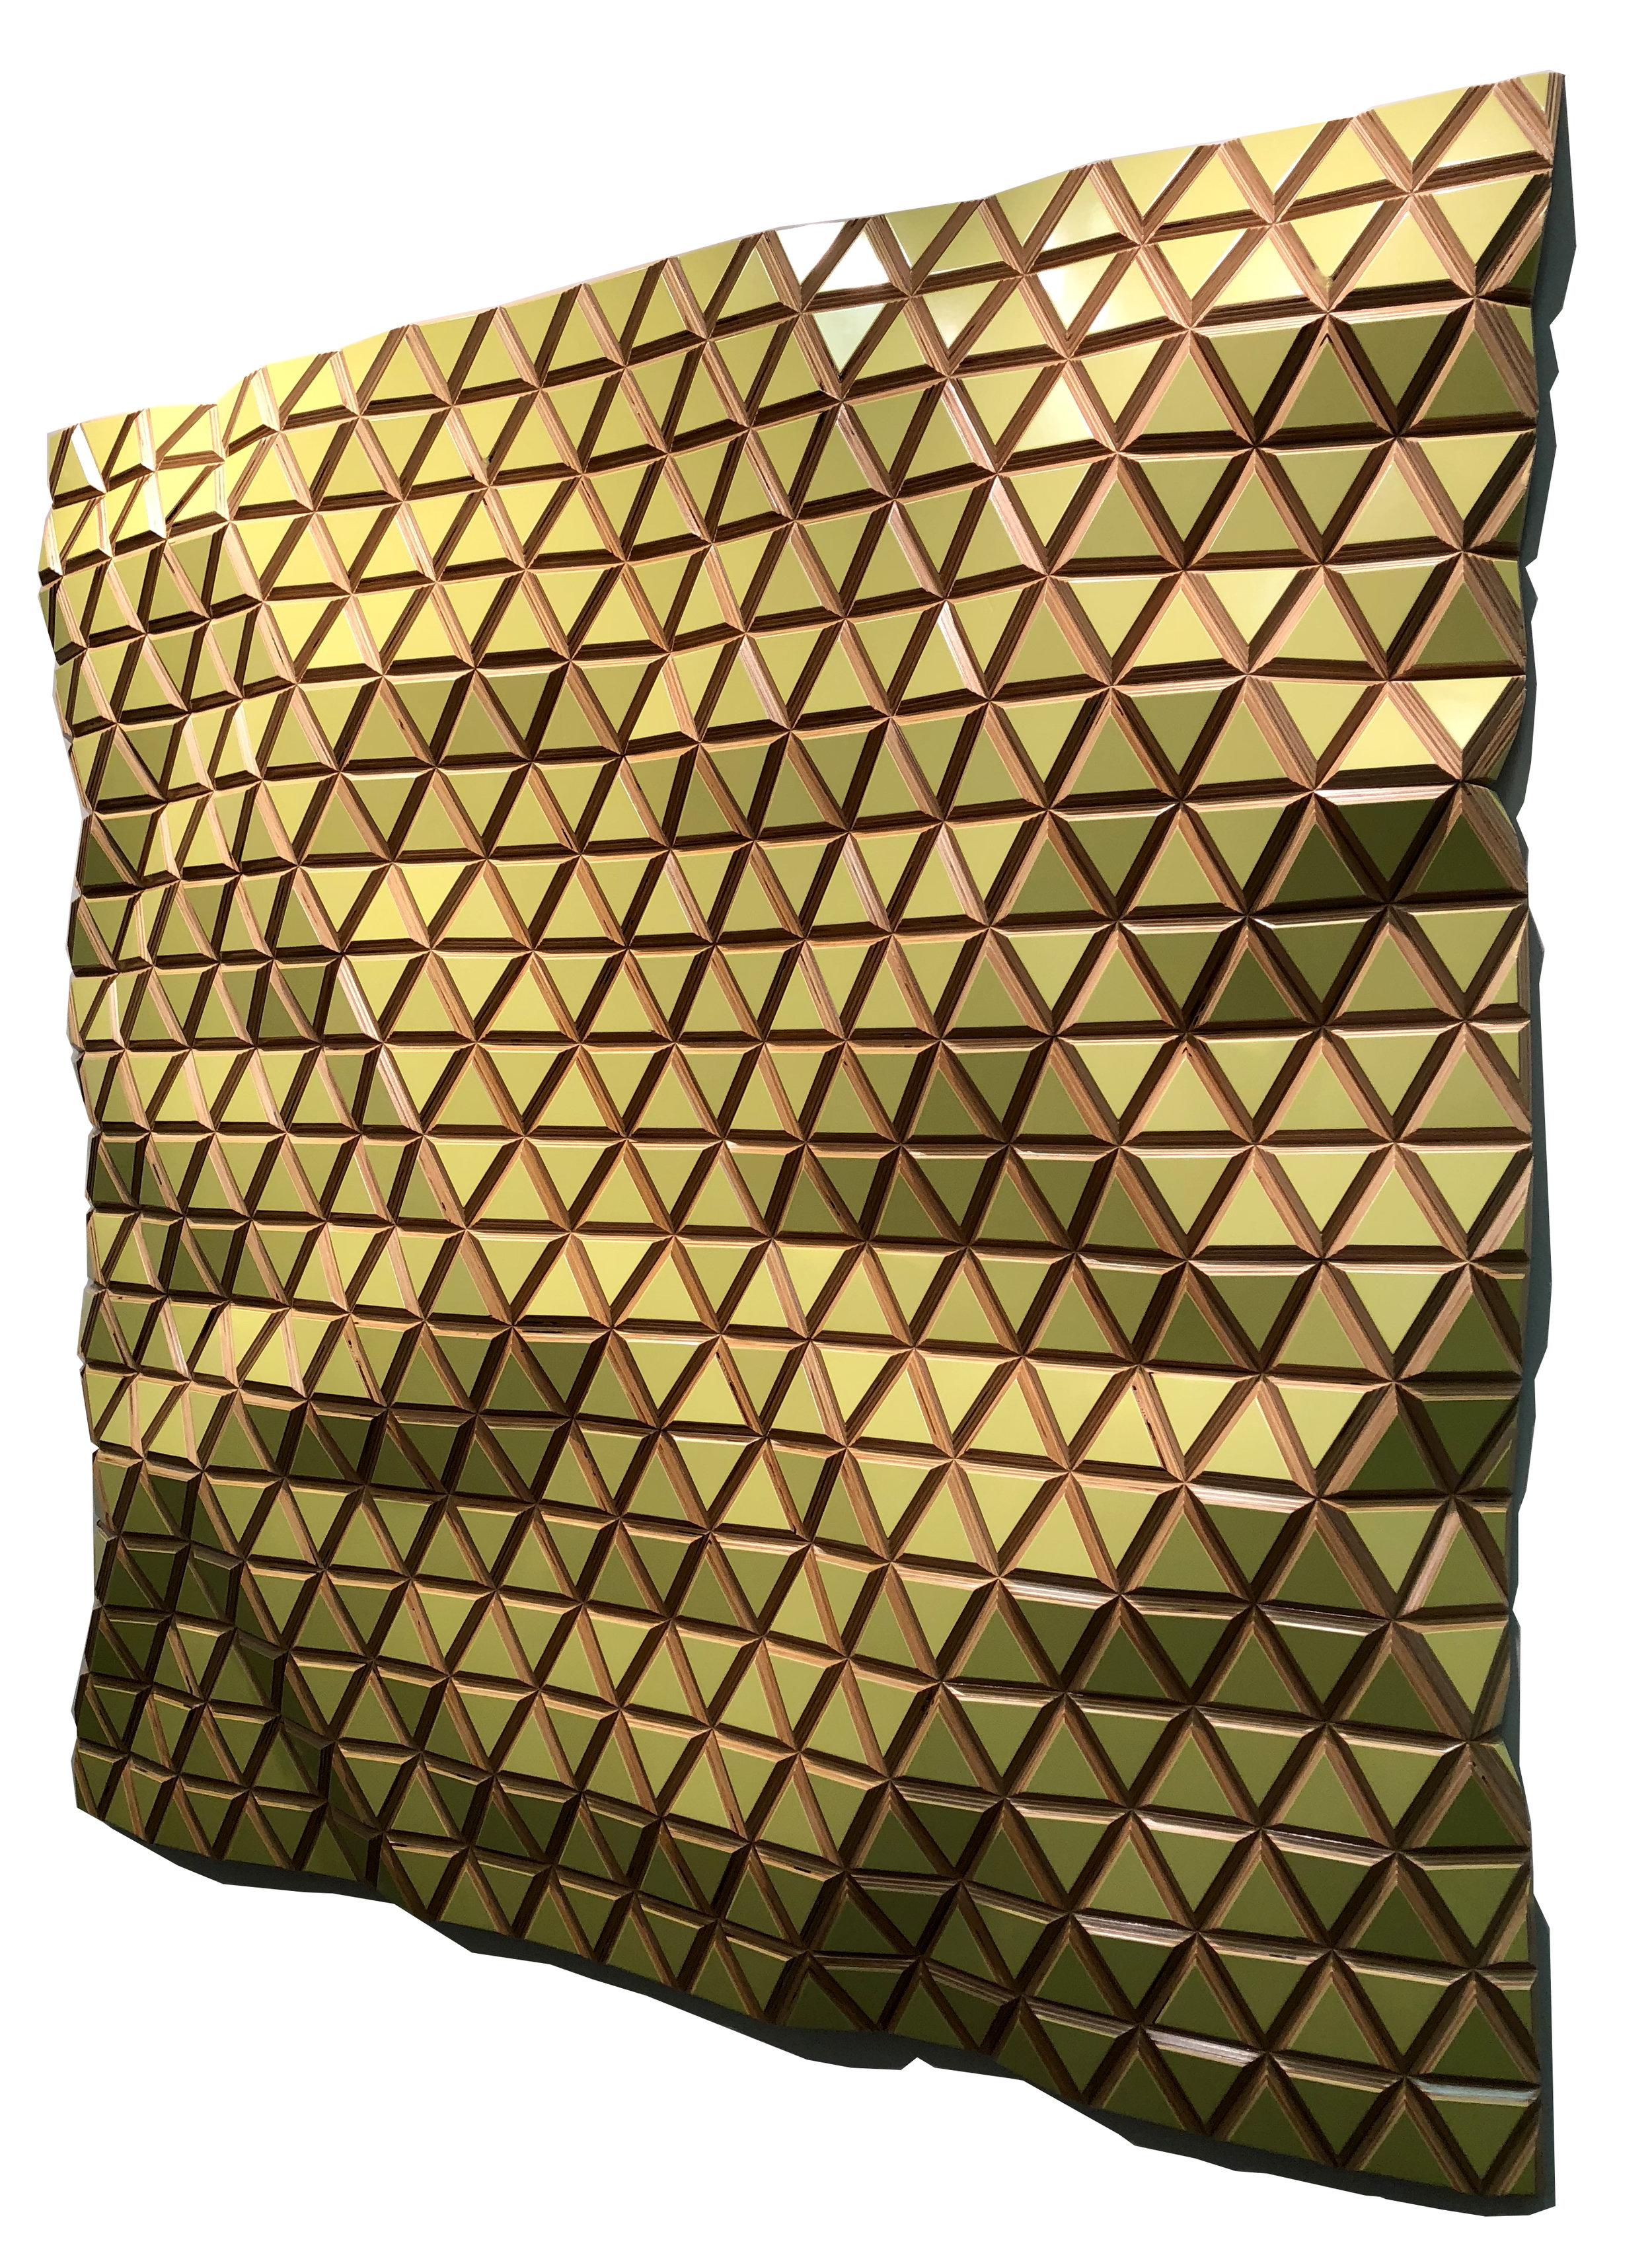 HGU_FR-Honeycomb Conjecture_57x59in_144x150cm_R2.jpg